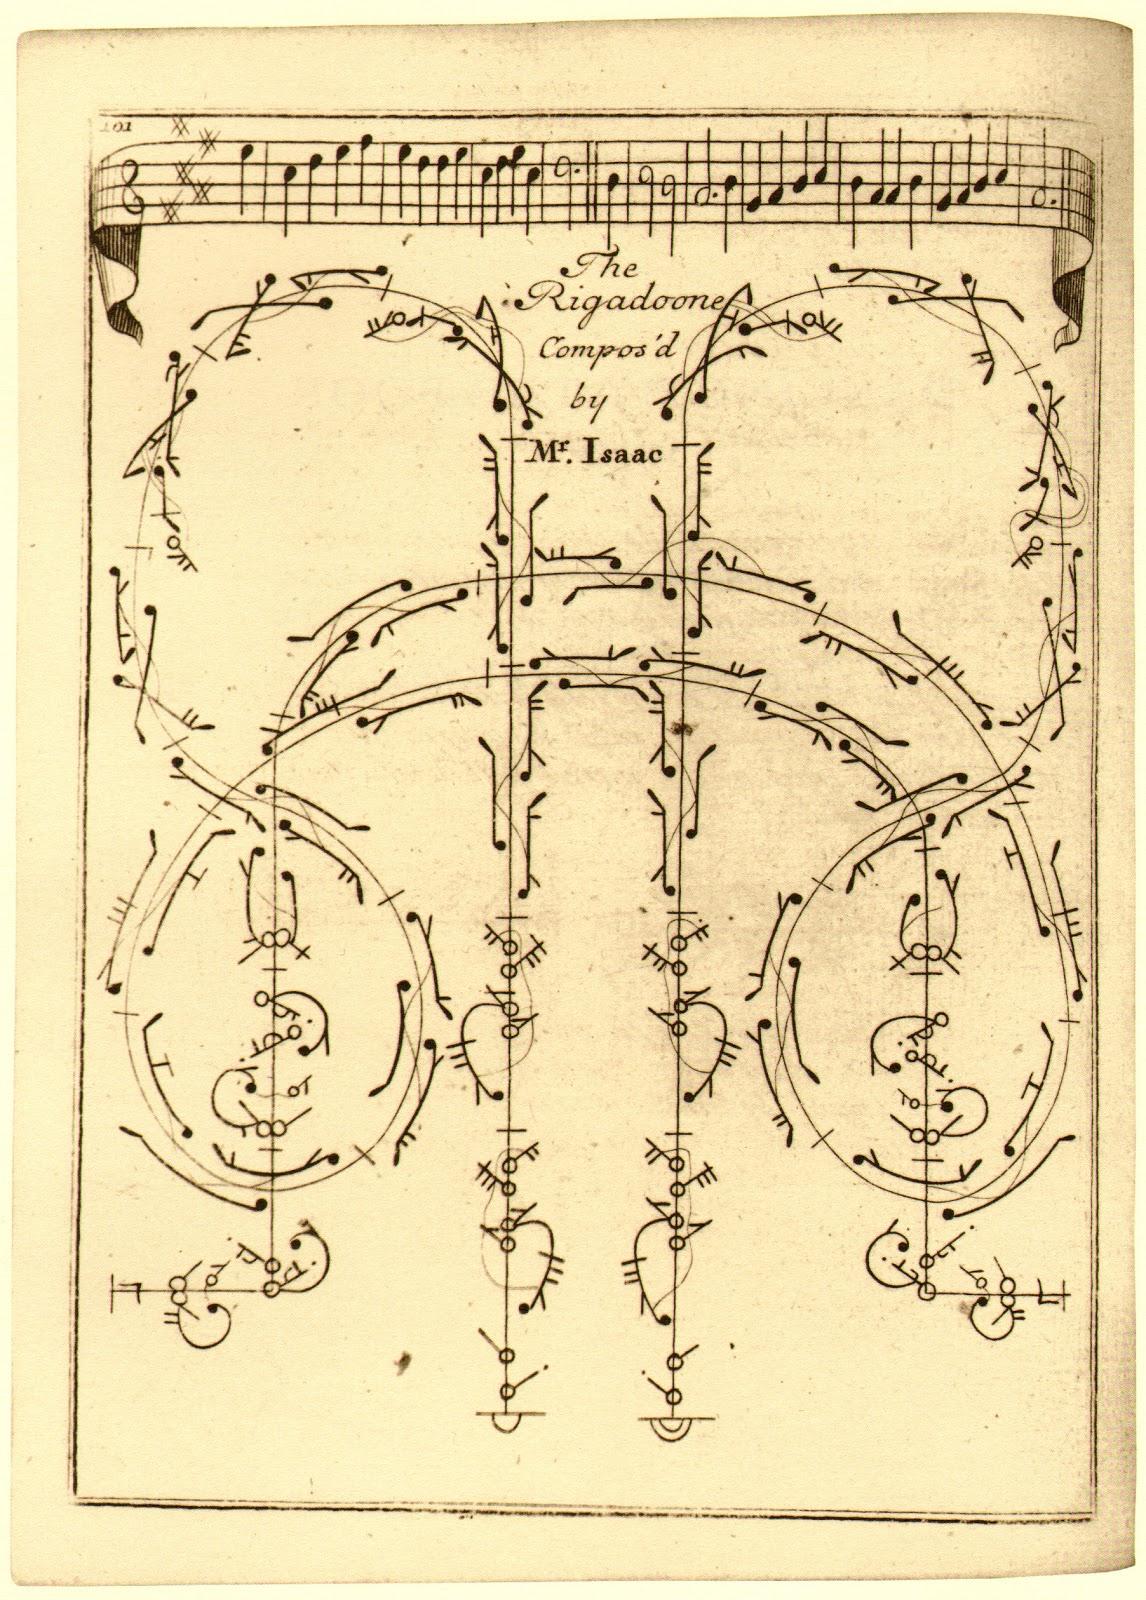 Feuillet Notation on 2 Step Dance Diagram